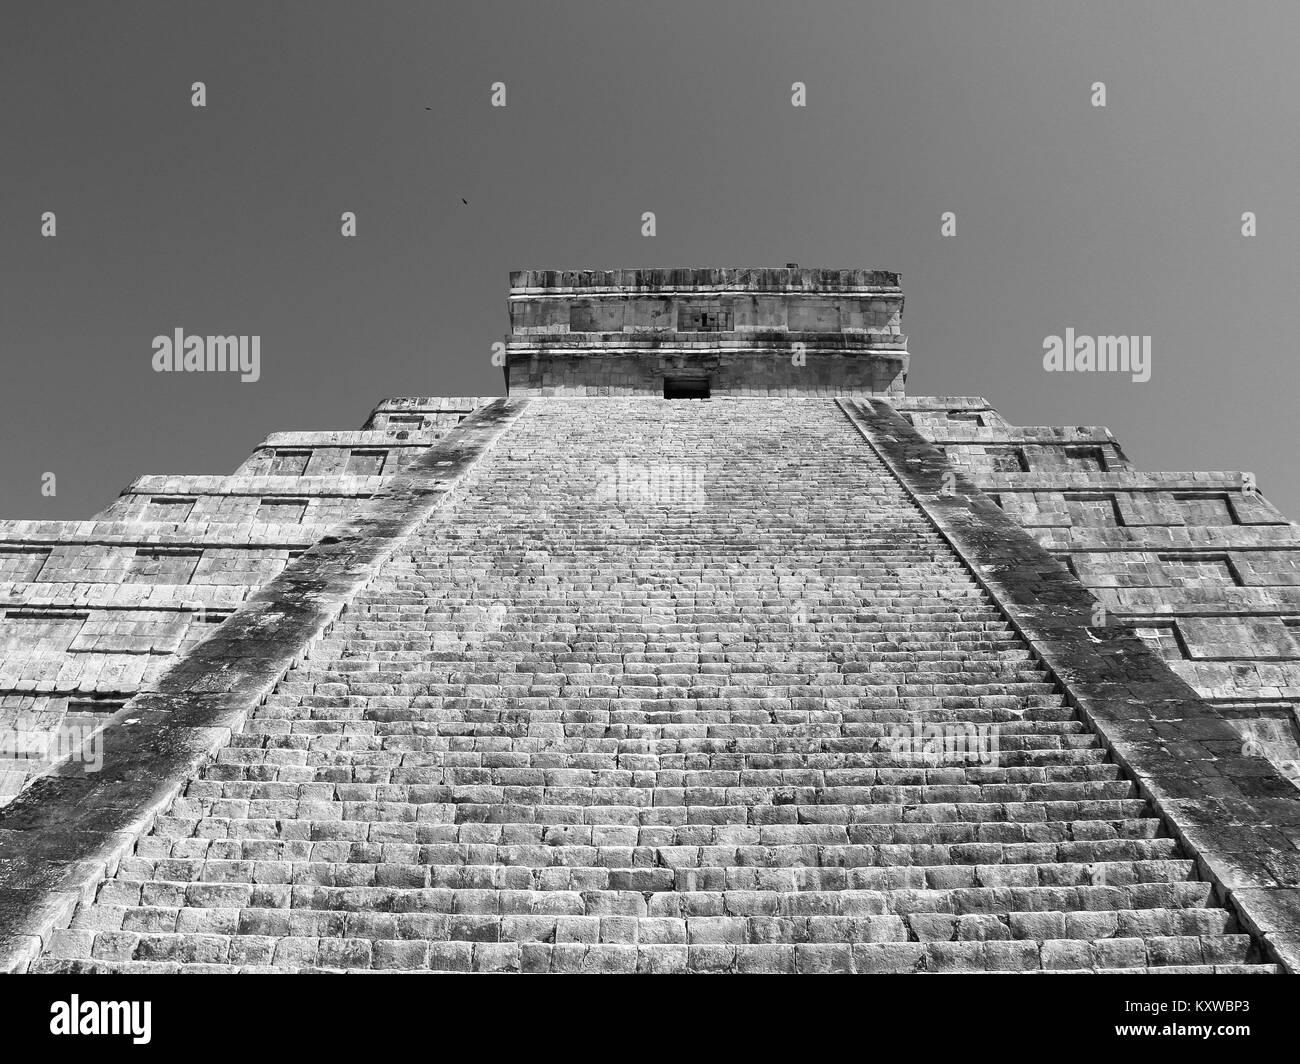 yucatan - Stock Image